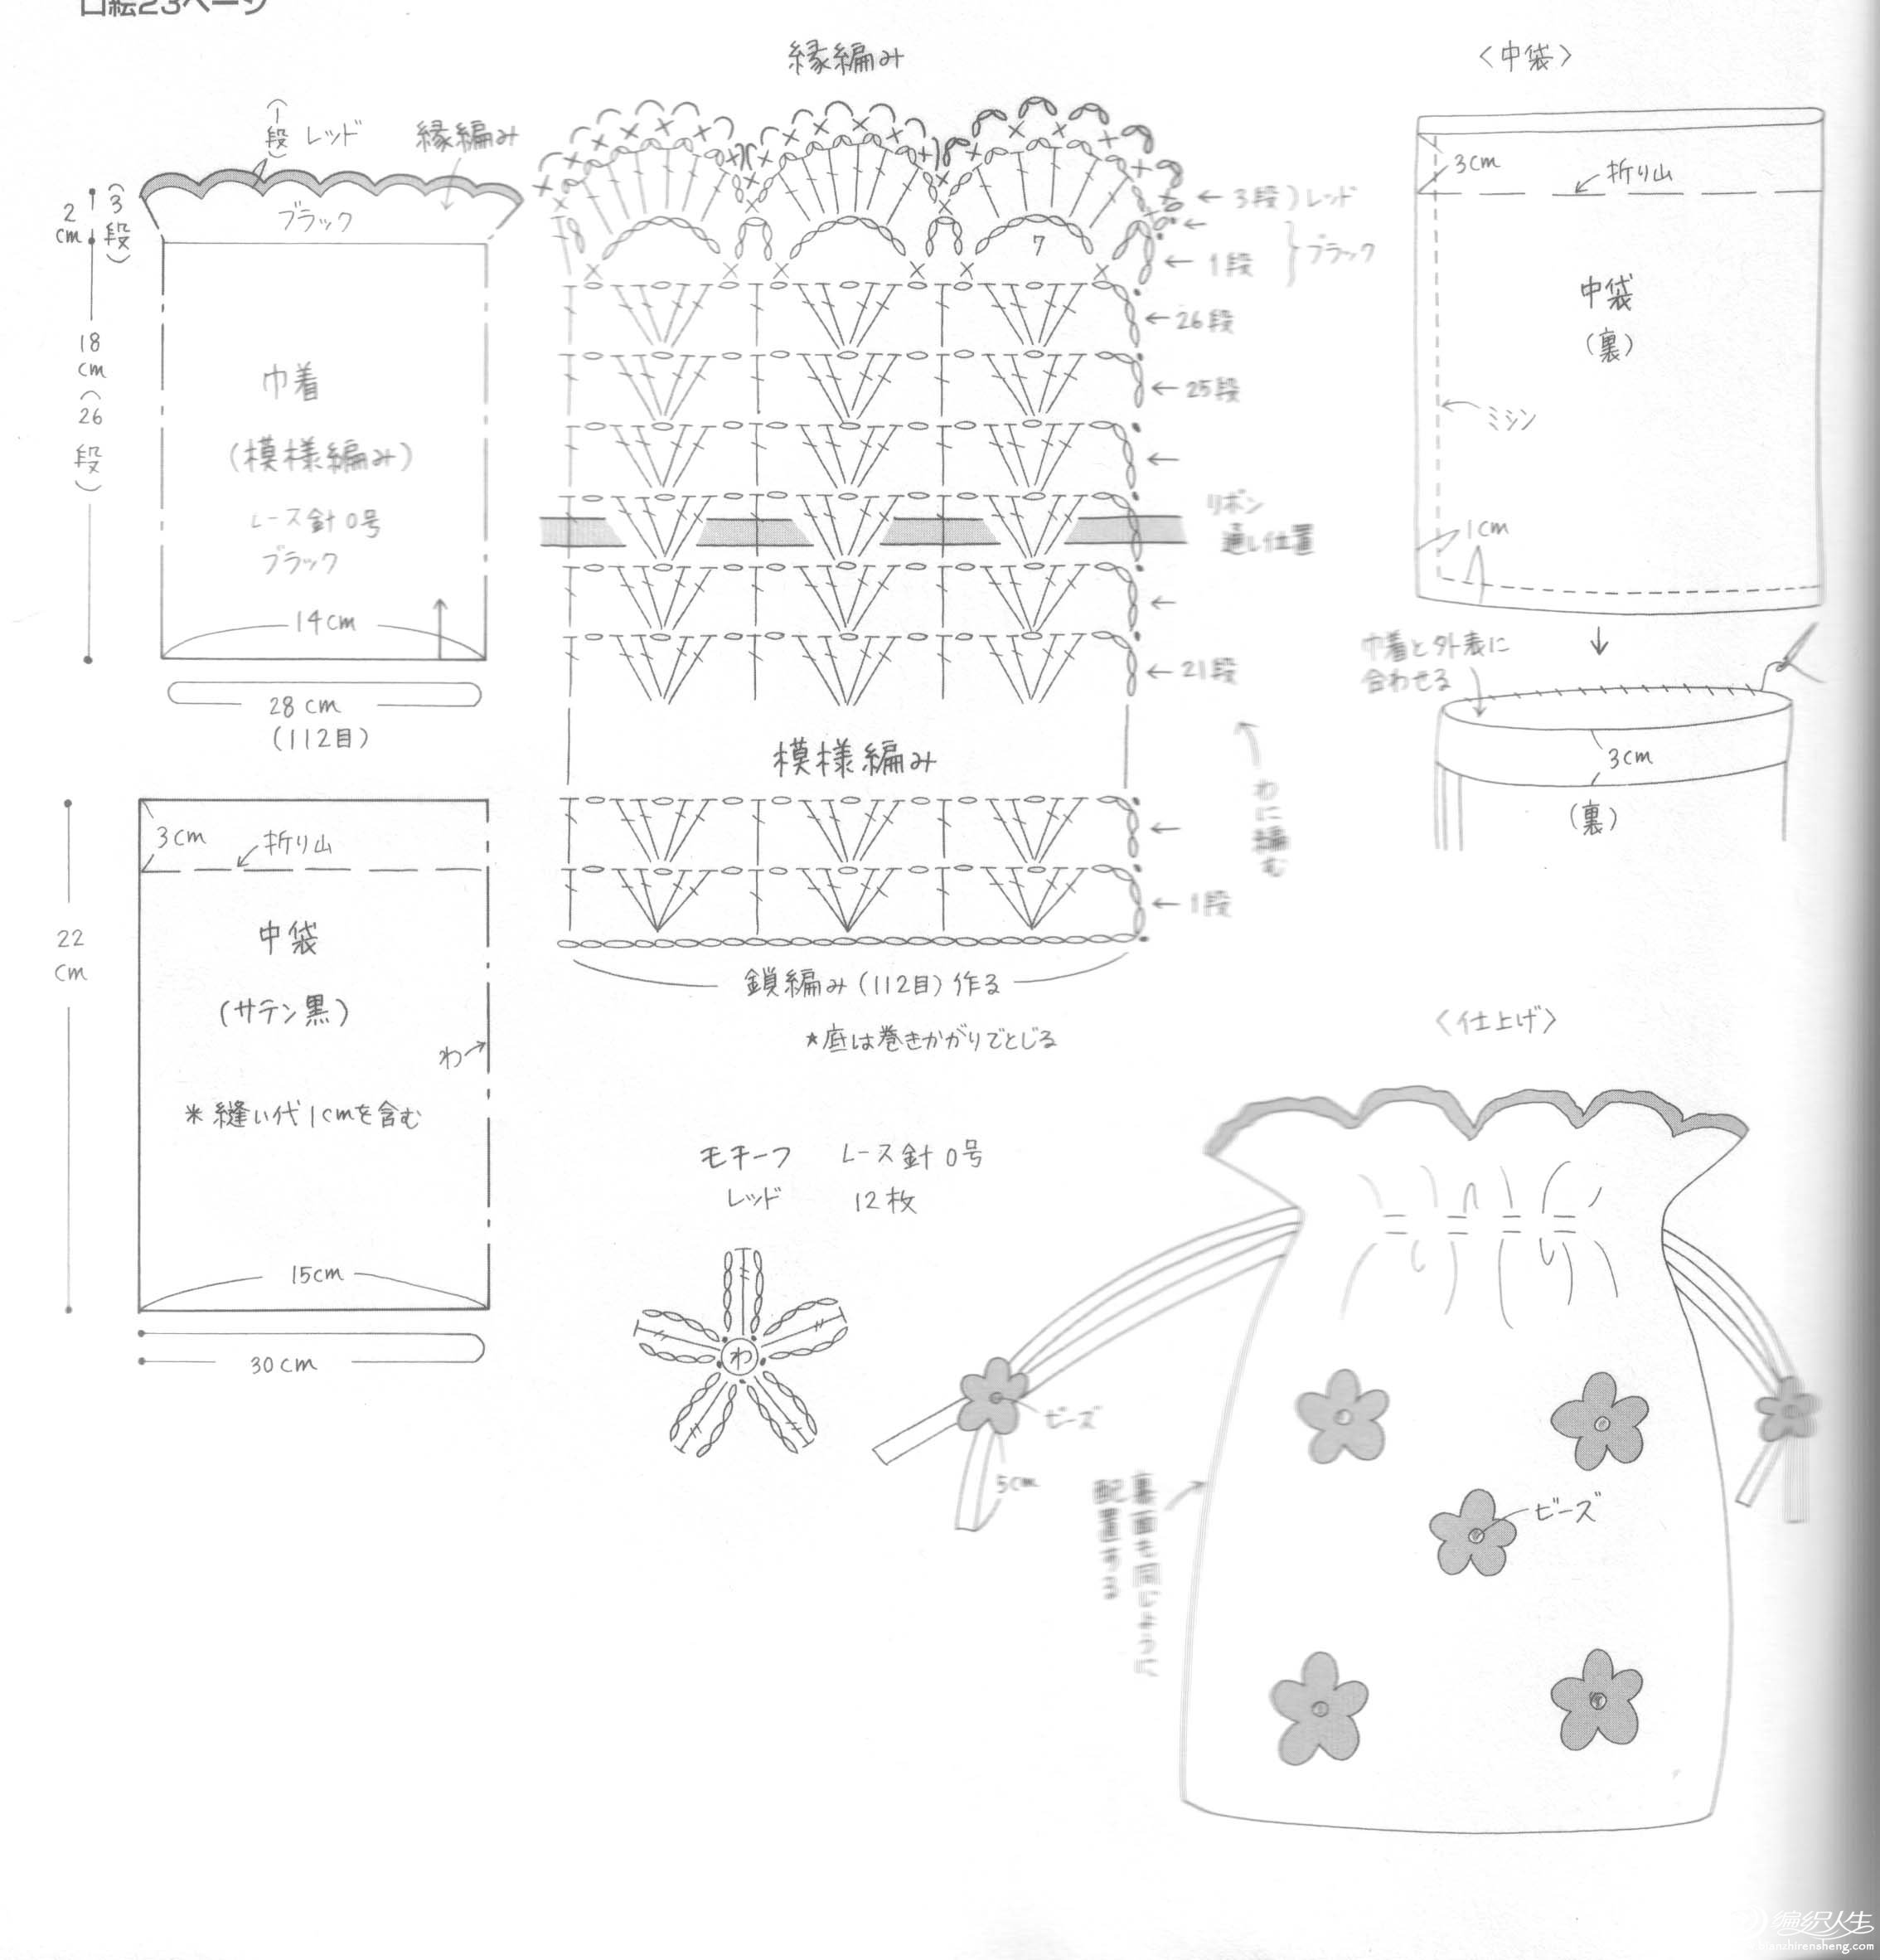 10-34a.jpg